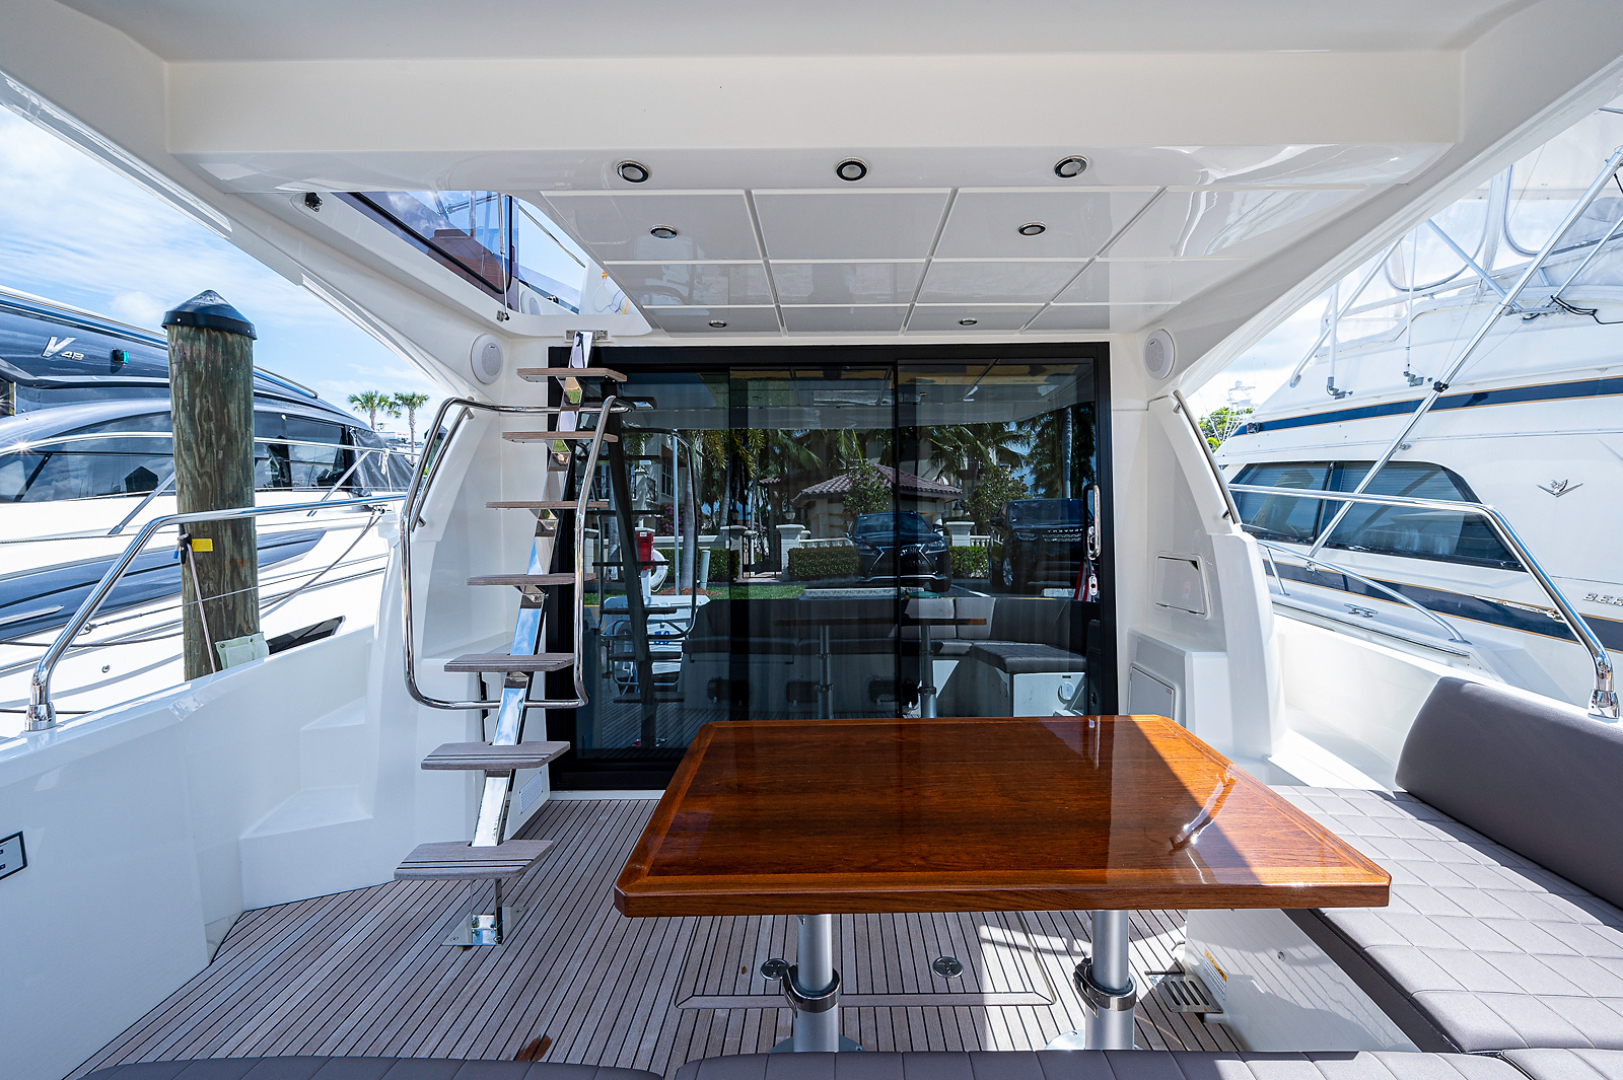 Prestige-460 Flybridge 2018-SEAQUEL Palm Beach Gardens-Florida-United States-Cockpit -1351137 | Thumbnail